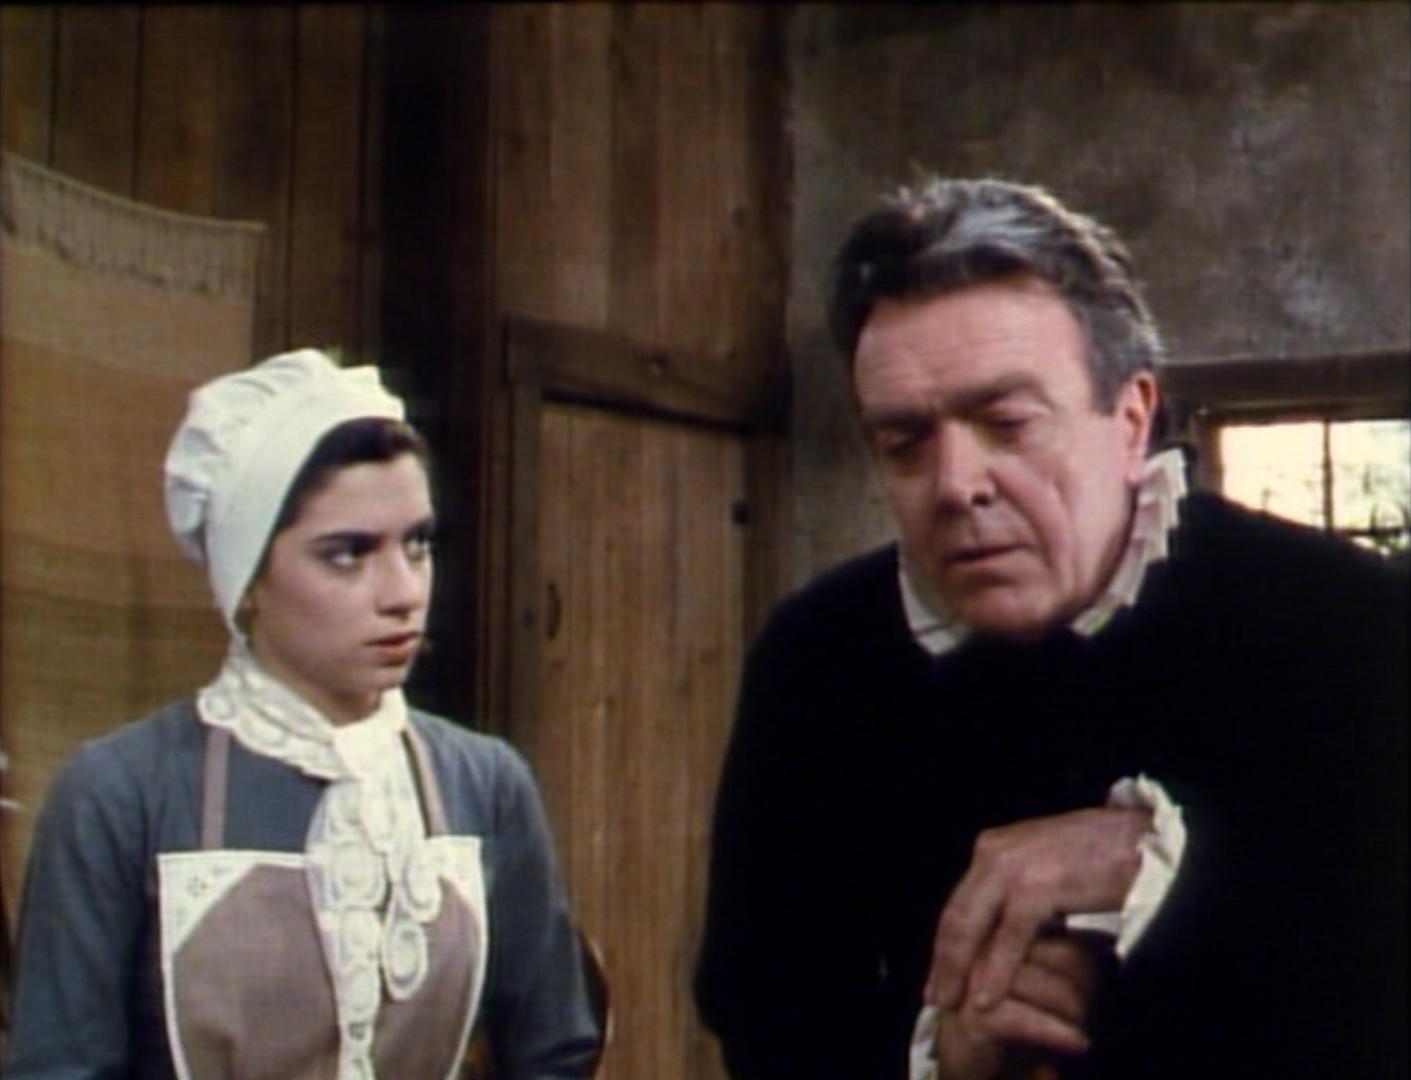 Haviland Morris tales from the darkside episode 82: the apprentice - midnite